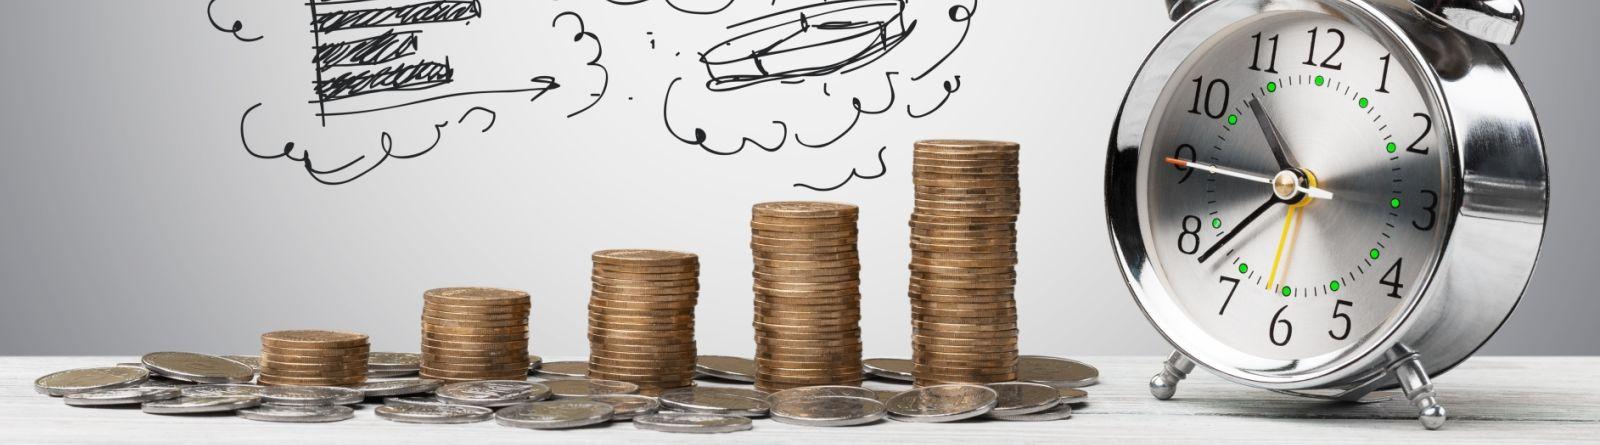 Axa Investment Managers, crescita robusta nel 2020